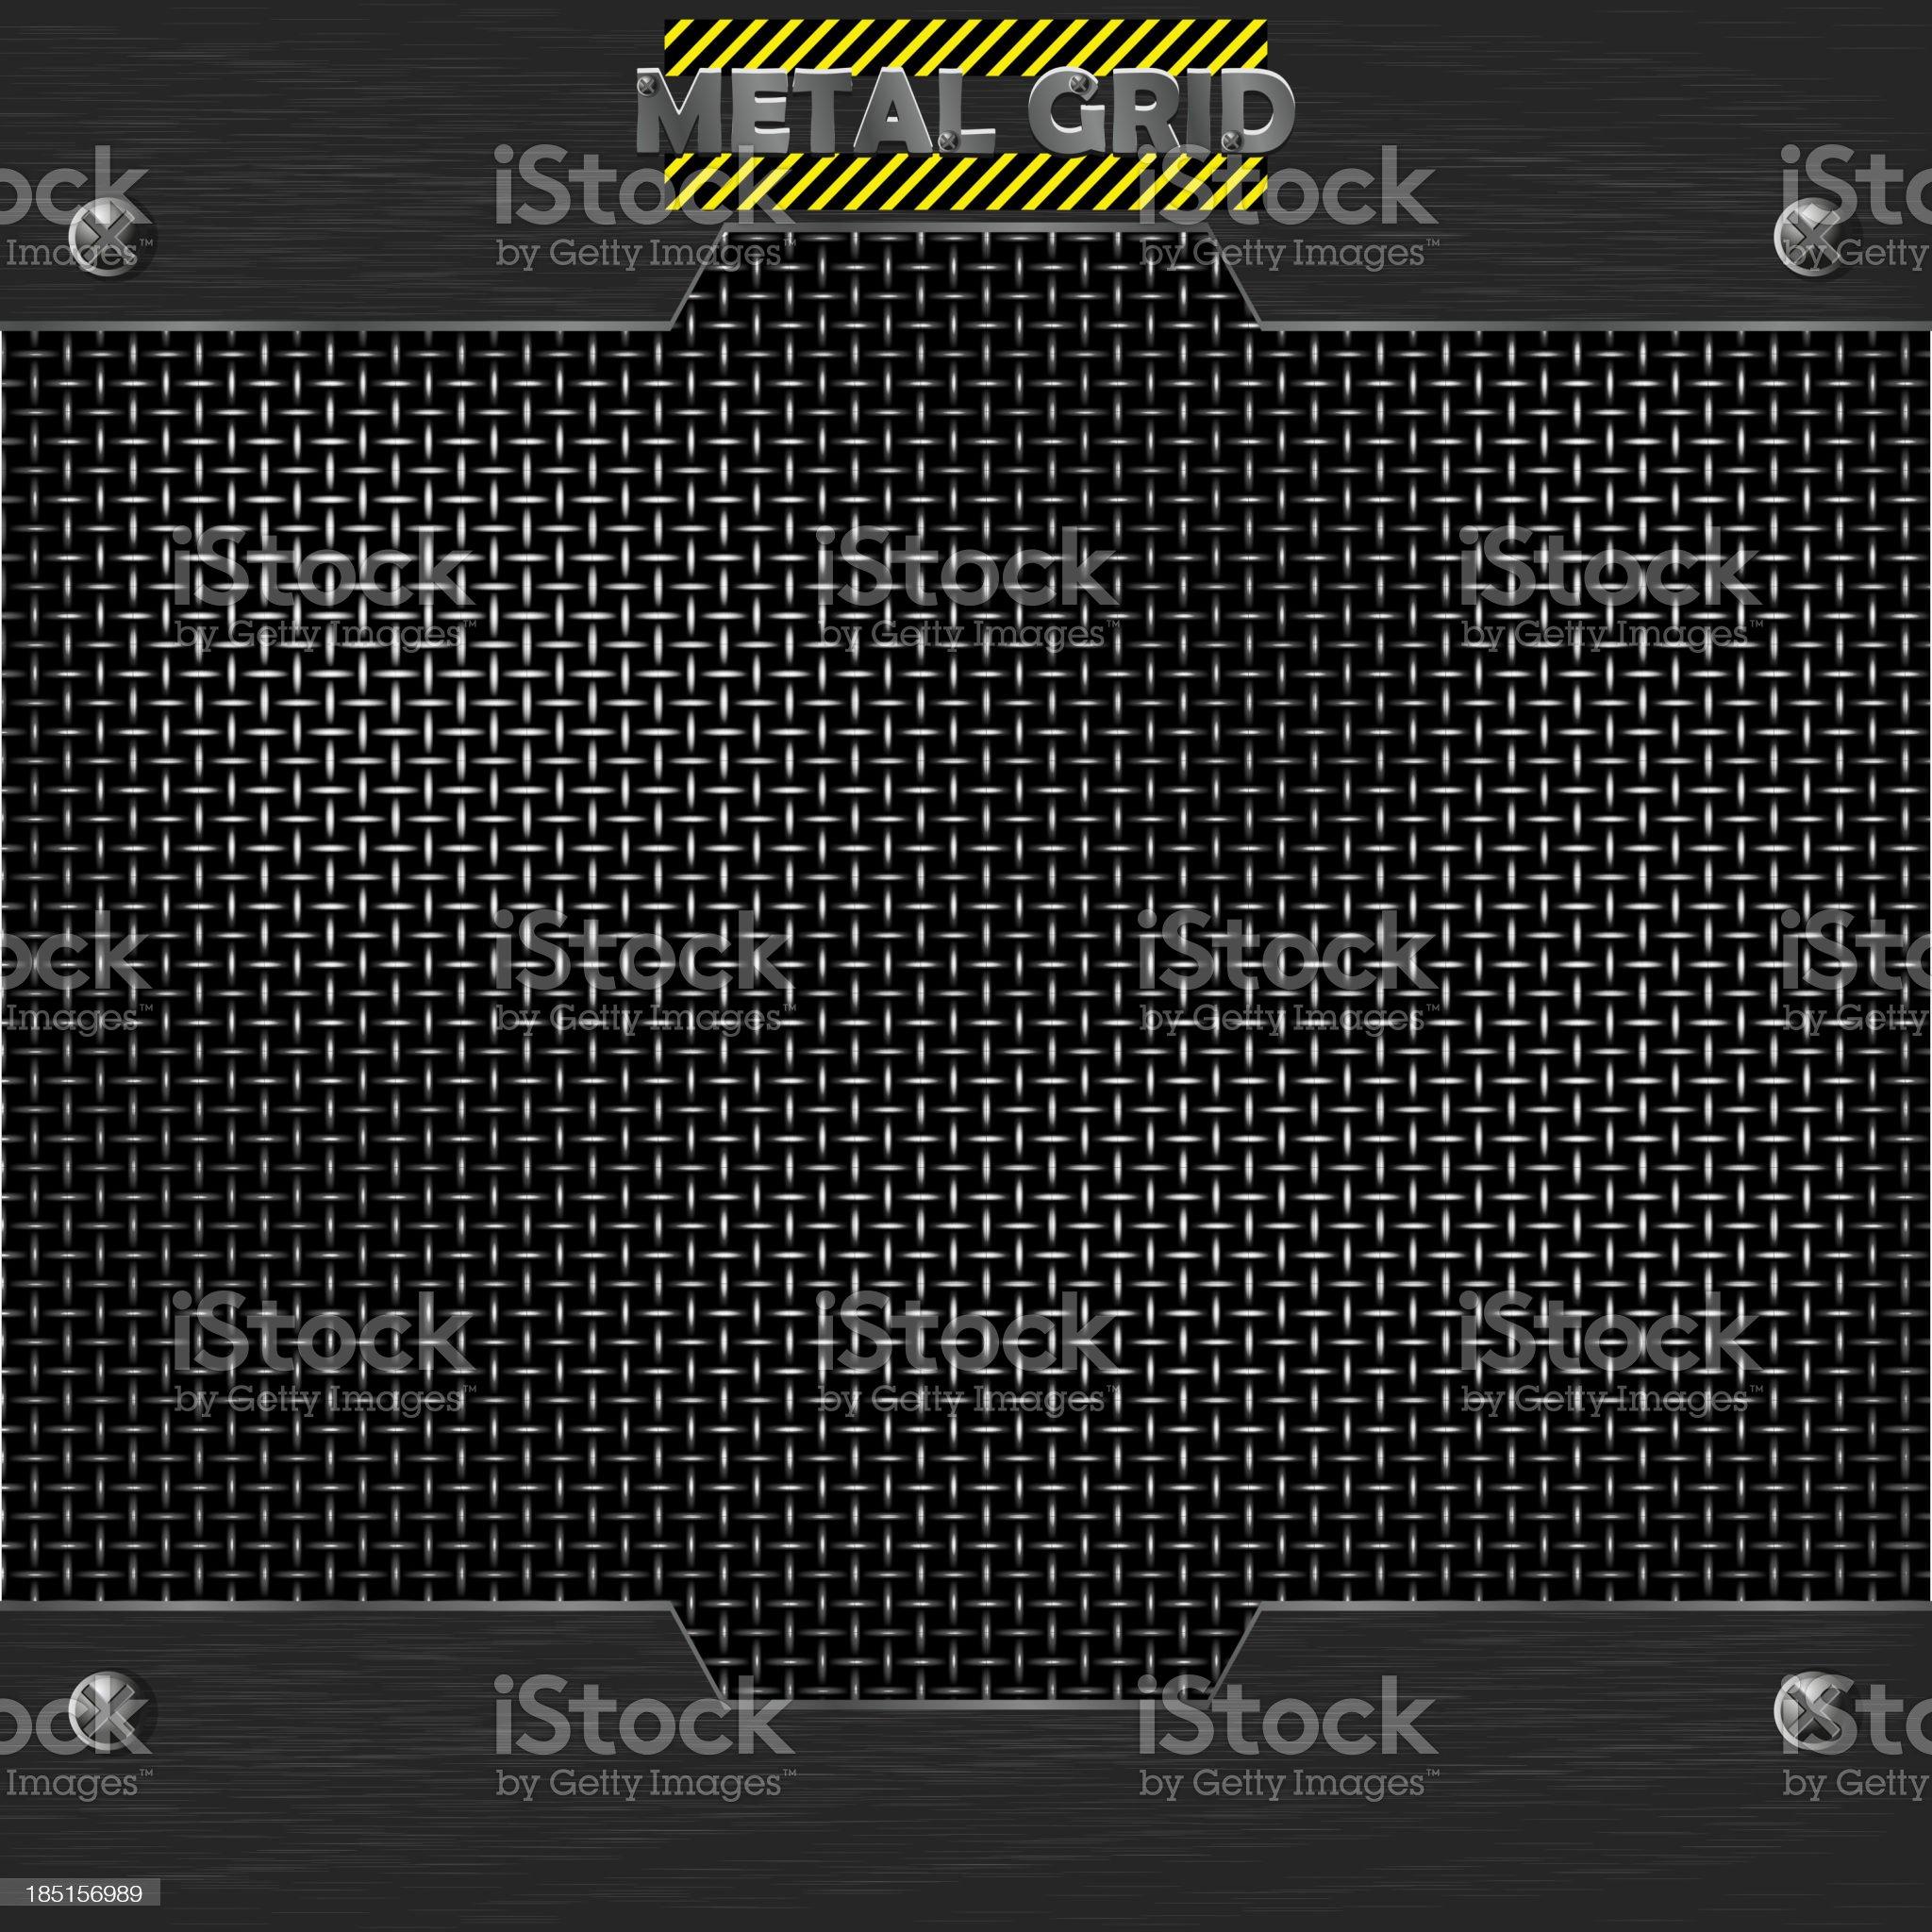 metal mesh texture vector royalty-free stock vector art